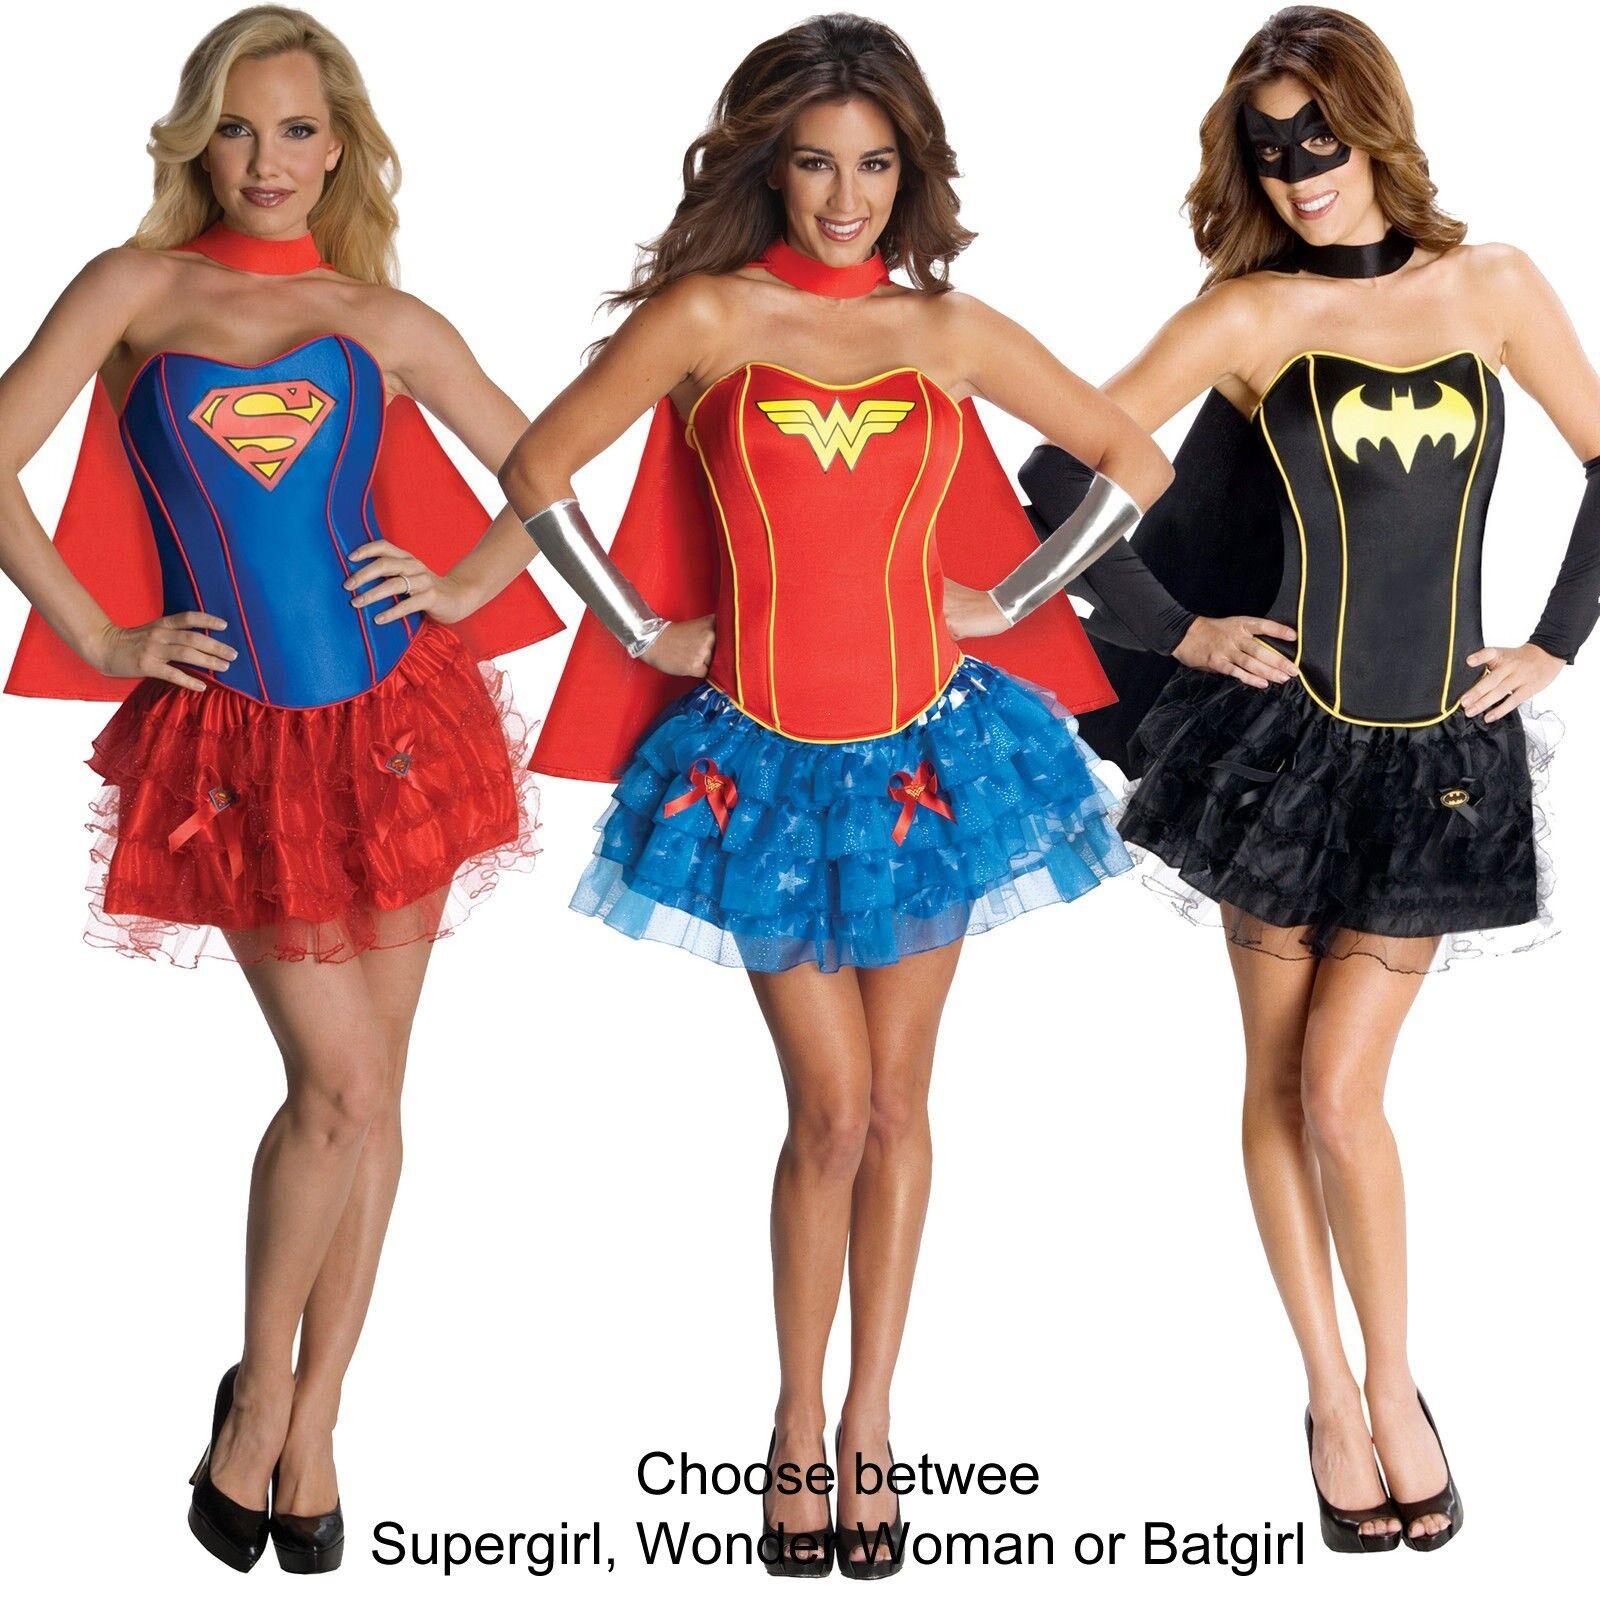 DC Superhero Supergirl / Wonder Woman / Batgirl Sexy Corset Costume